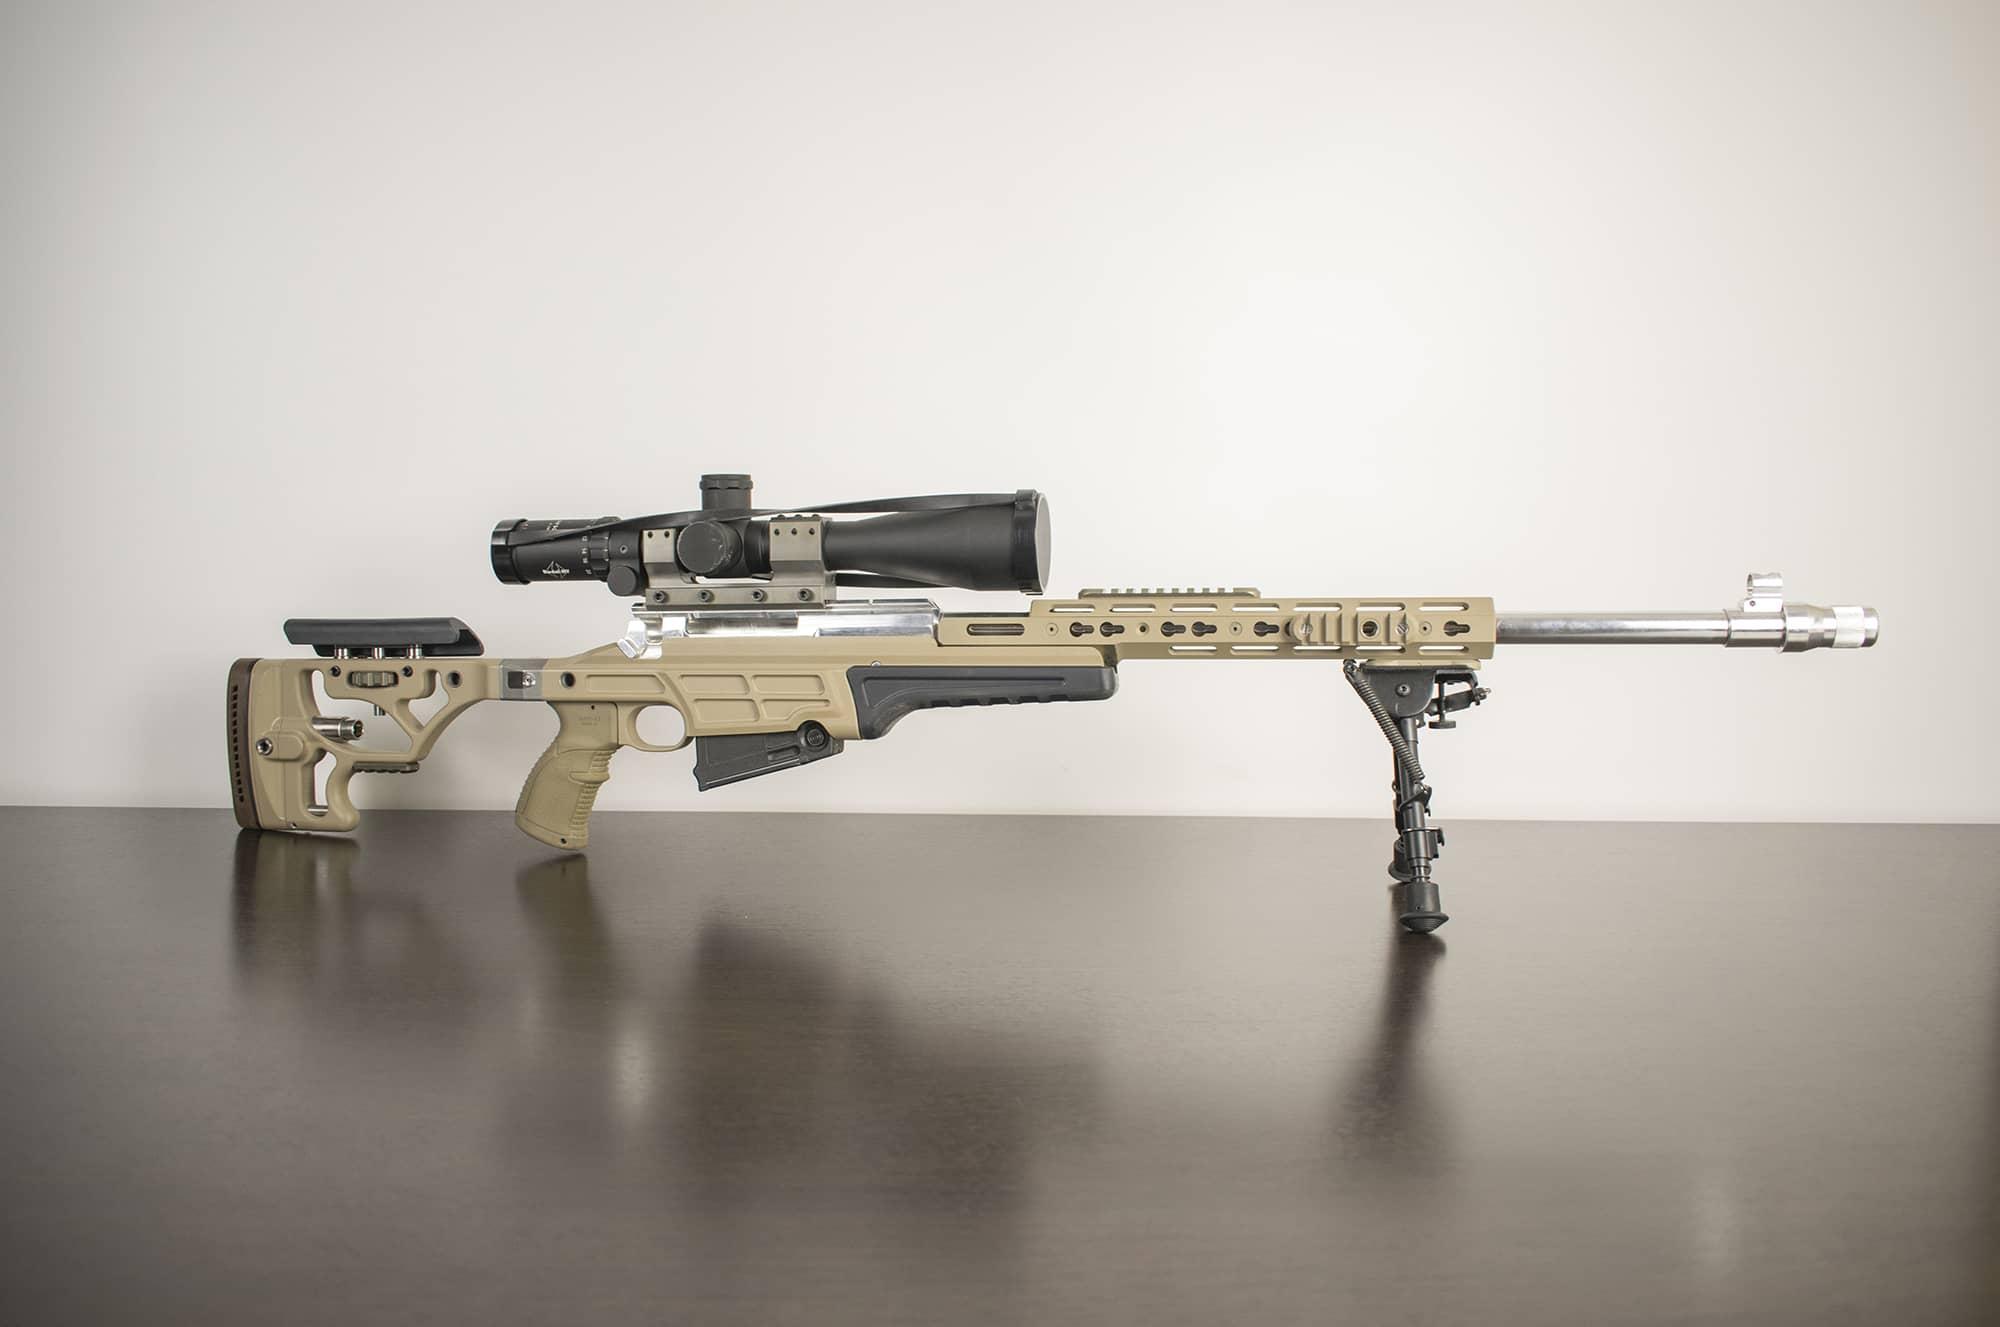 Ложа OV-SG69 cnc guns custom